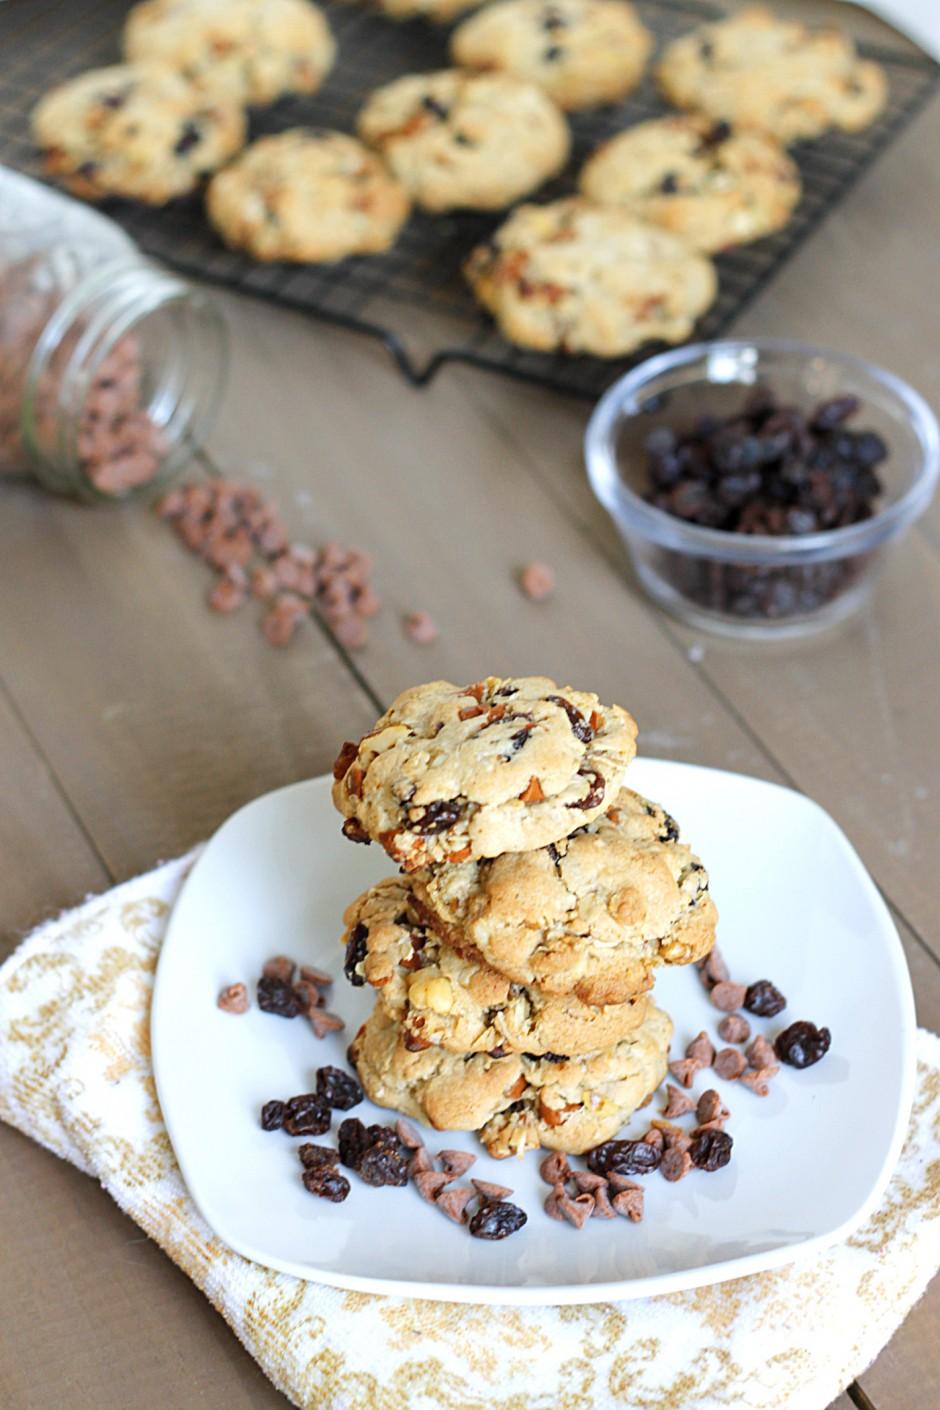 Cinnamon Raisin Walnut Oatmeal Cookies | Fabtastic Eats - Fabtastic ...